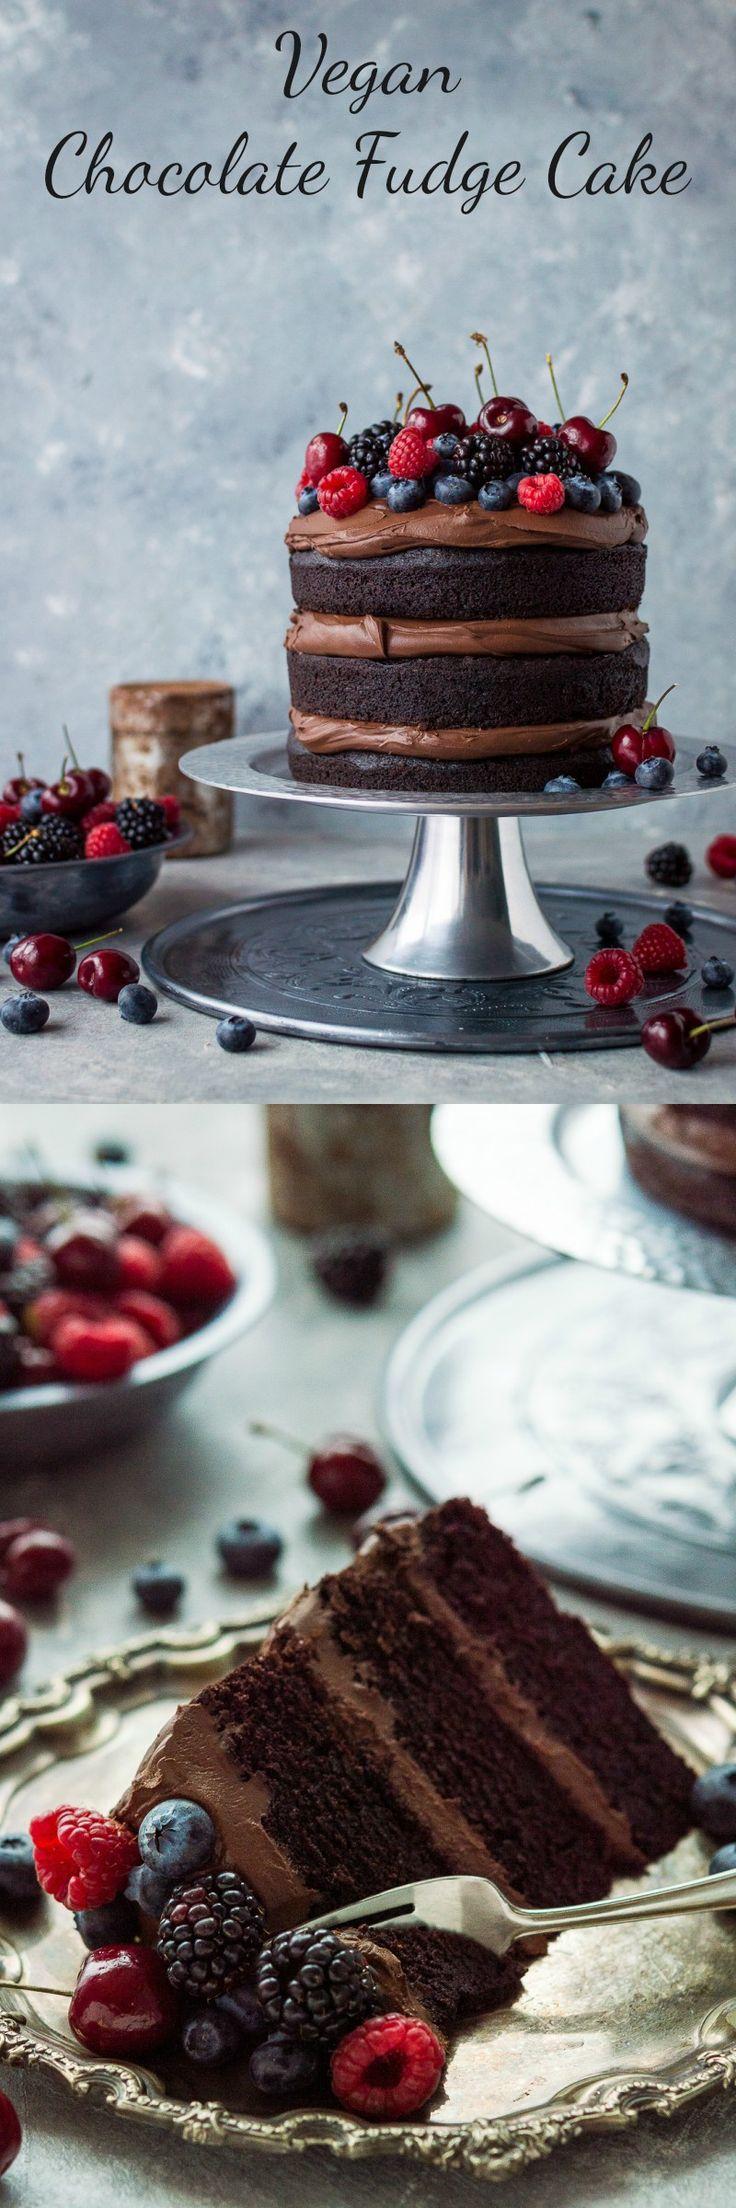 Vegan chocolate fudge cake - an easy to make, moist, fudgy vegan chocolate cake topped with coconut milk ganache. No one will be able to guess that it's vegan! #vegan #baking #chocolatecake